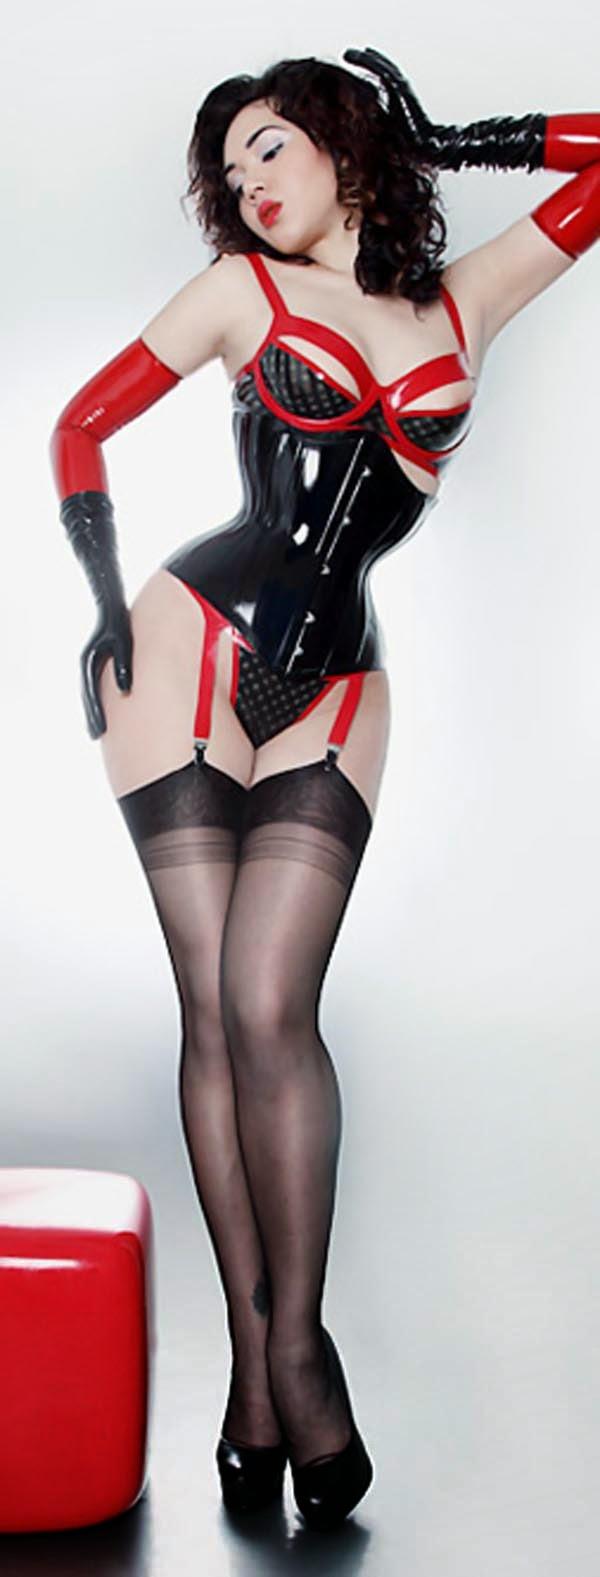 corset+rules+(27).jpg